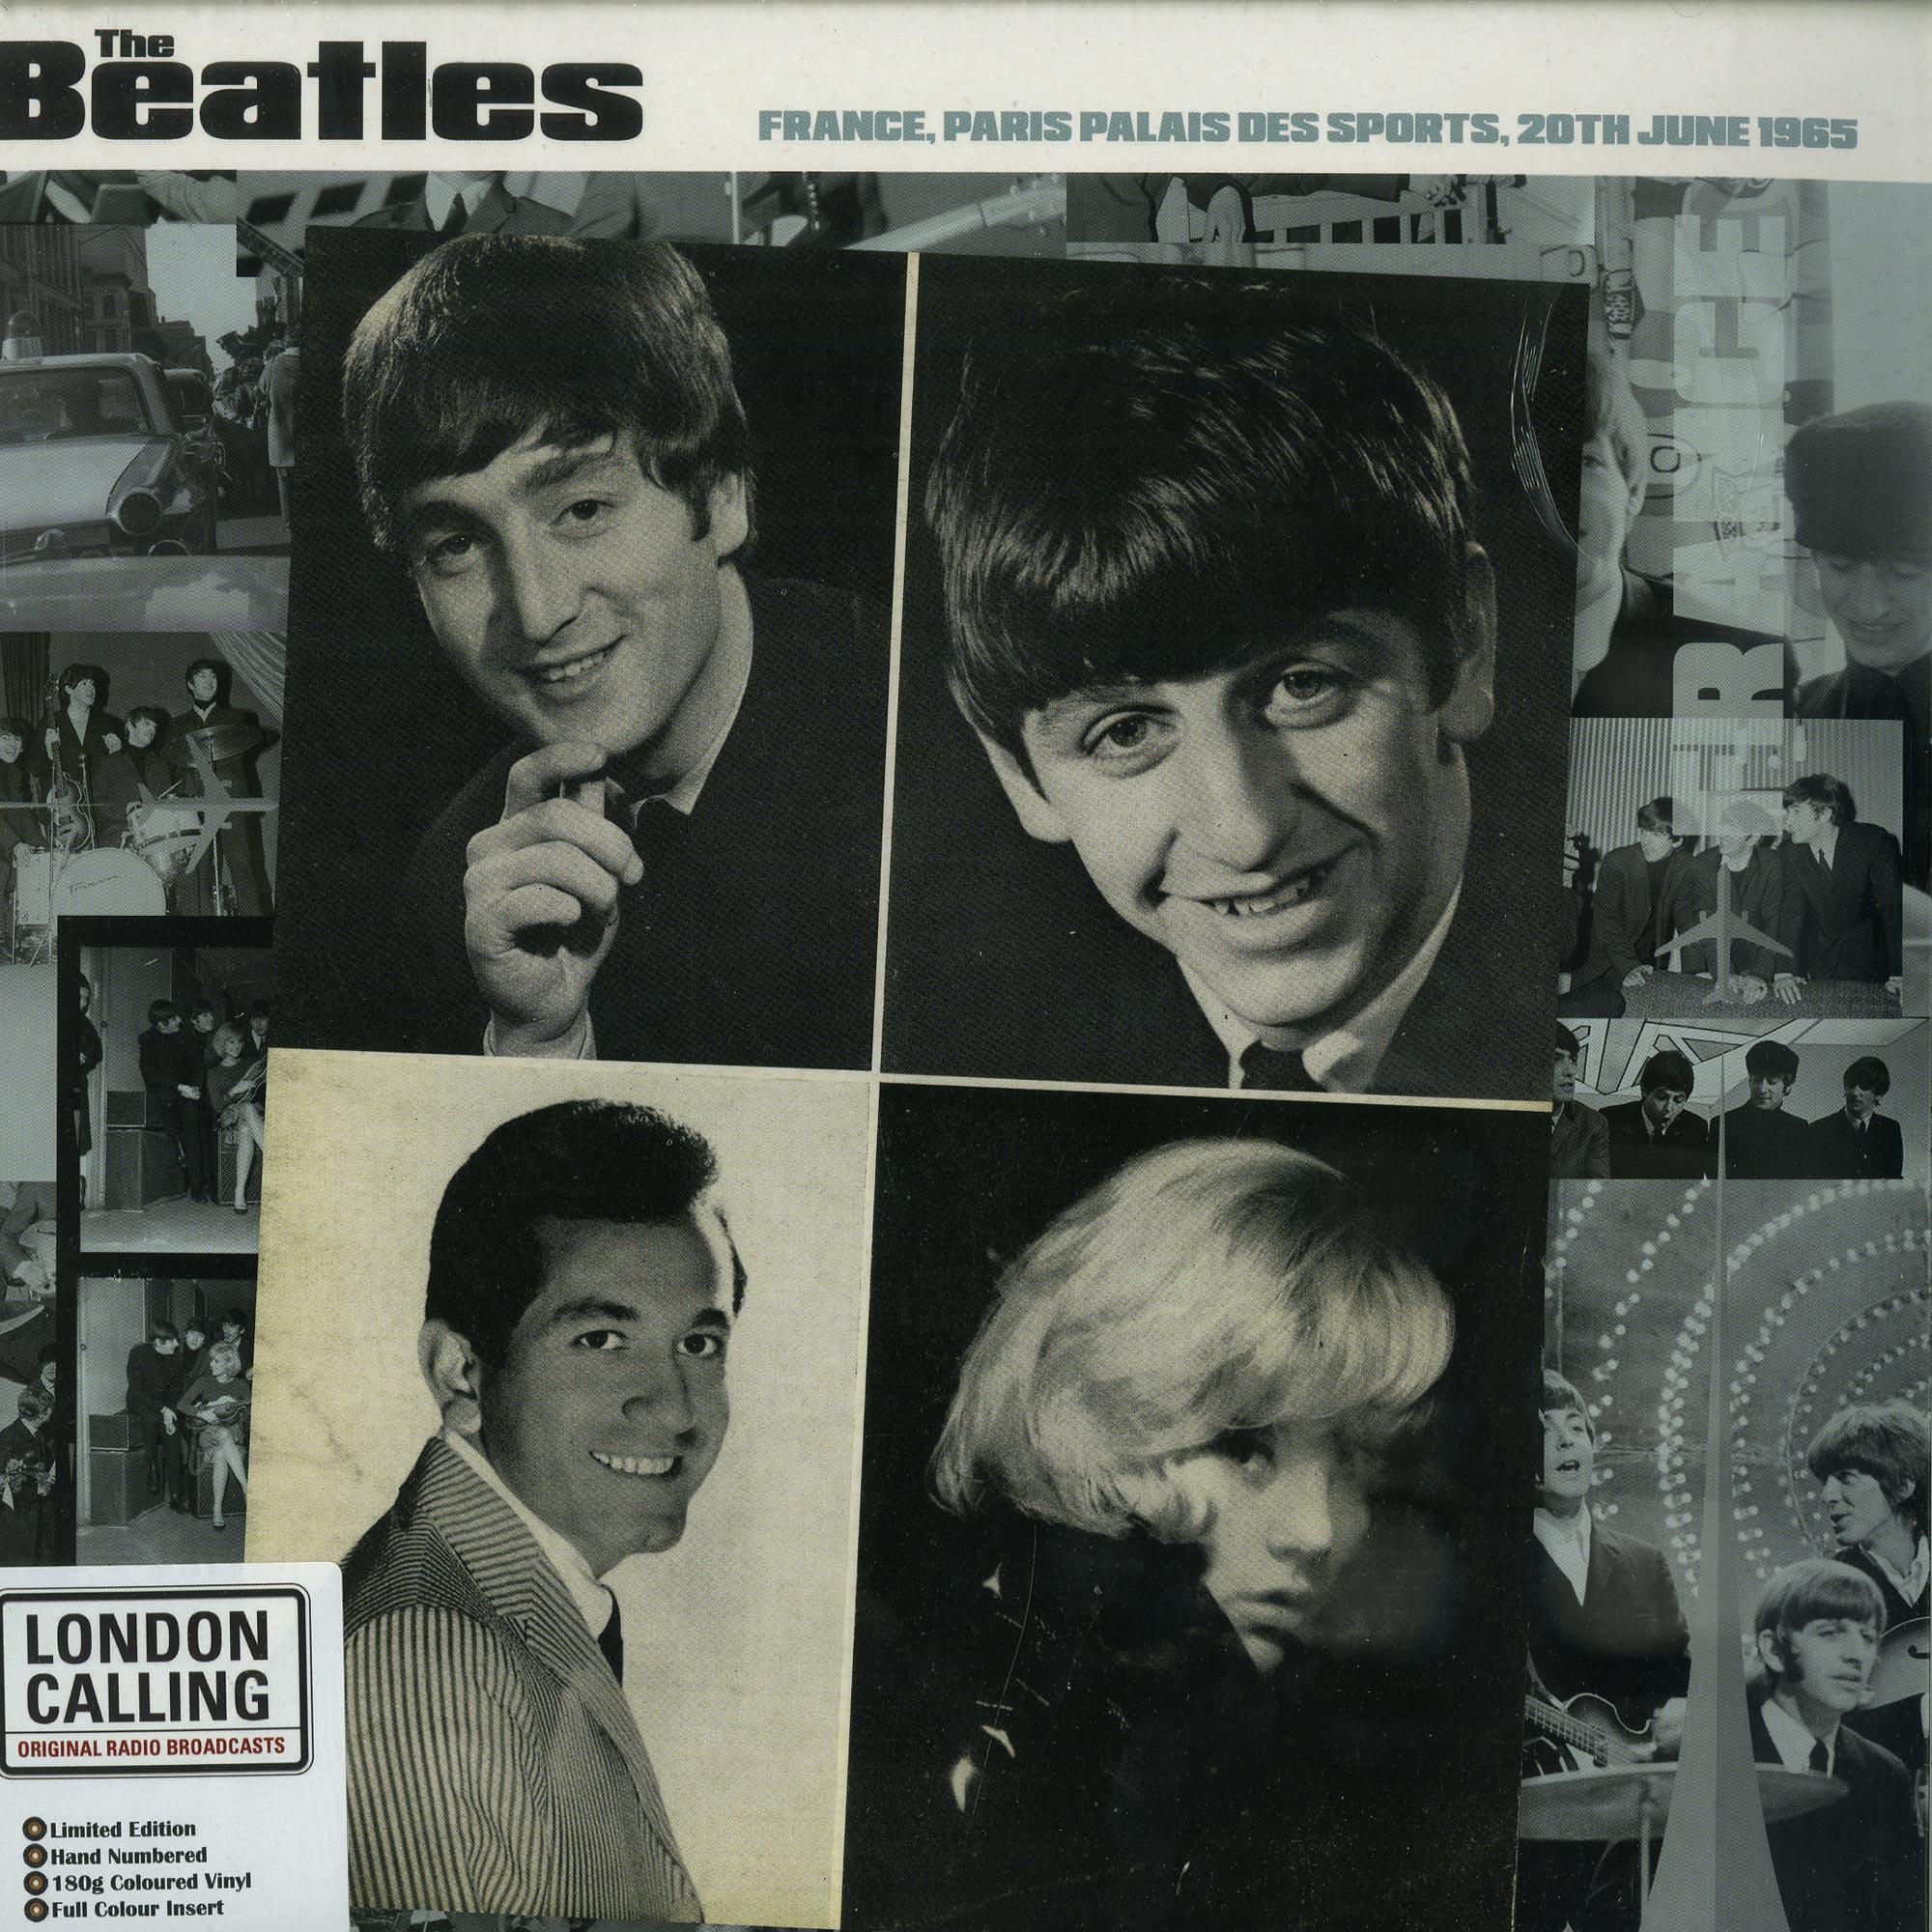 The Beatles - PARIS 20TH JUNE 1965